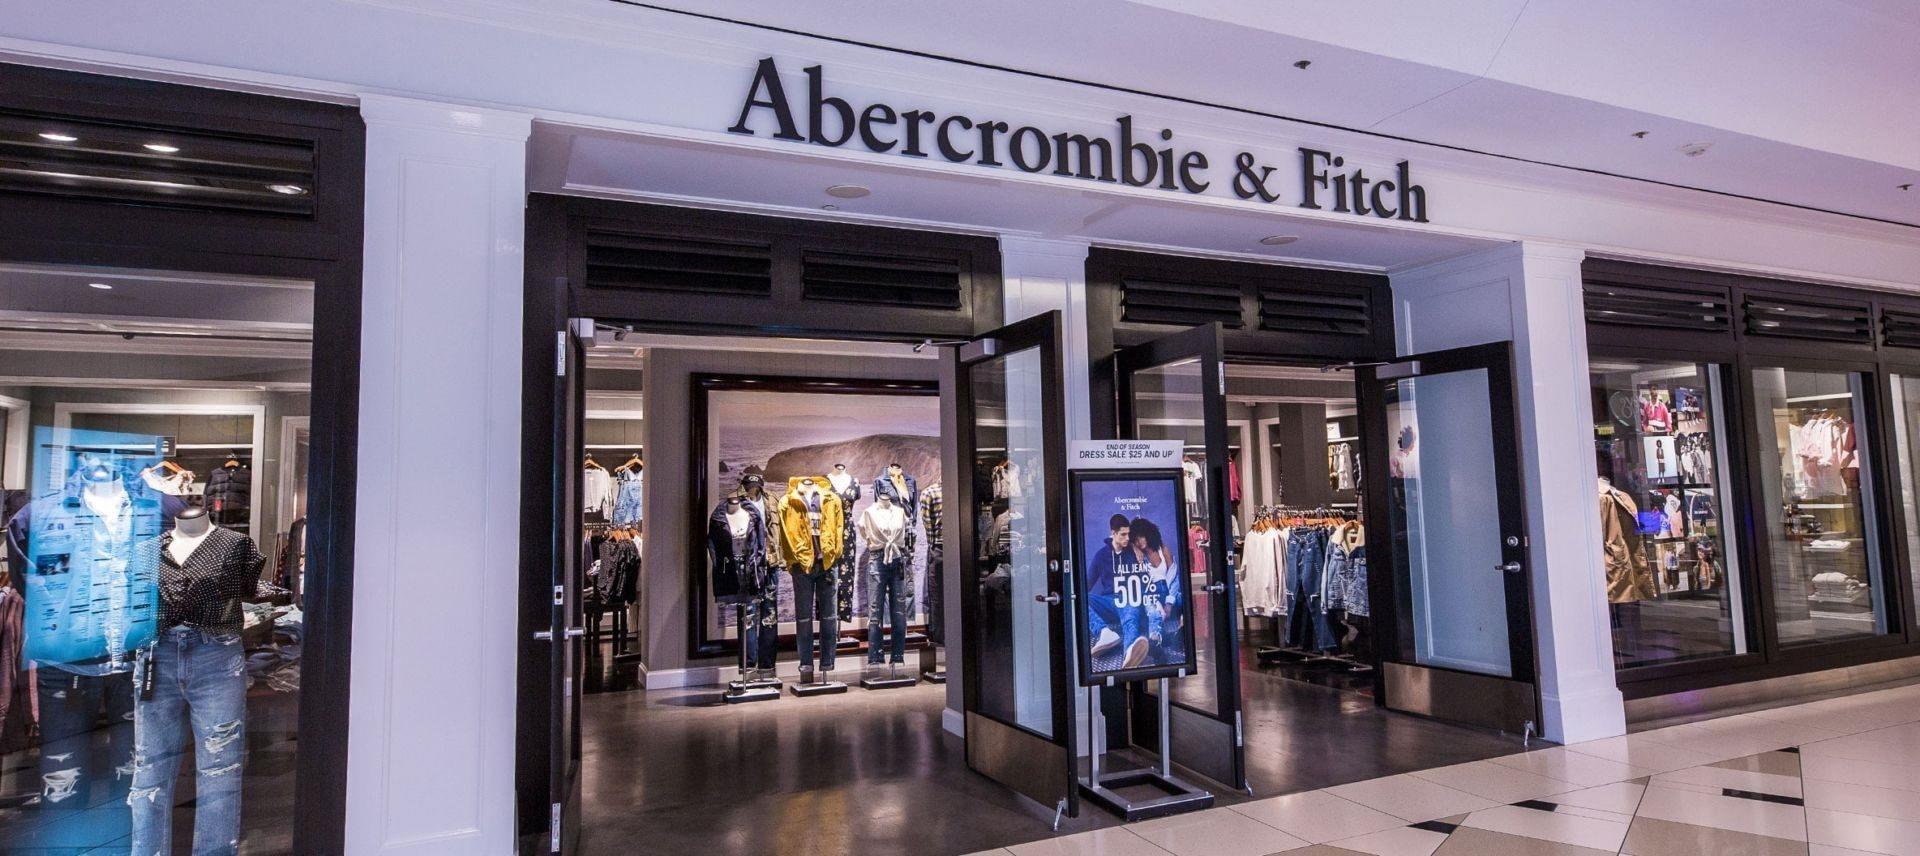 Abercrombie & Fitch Store Washington DC Go Pro Construction Remodel Project